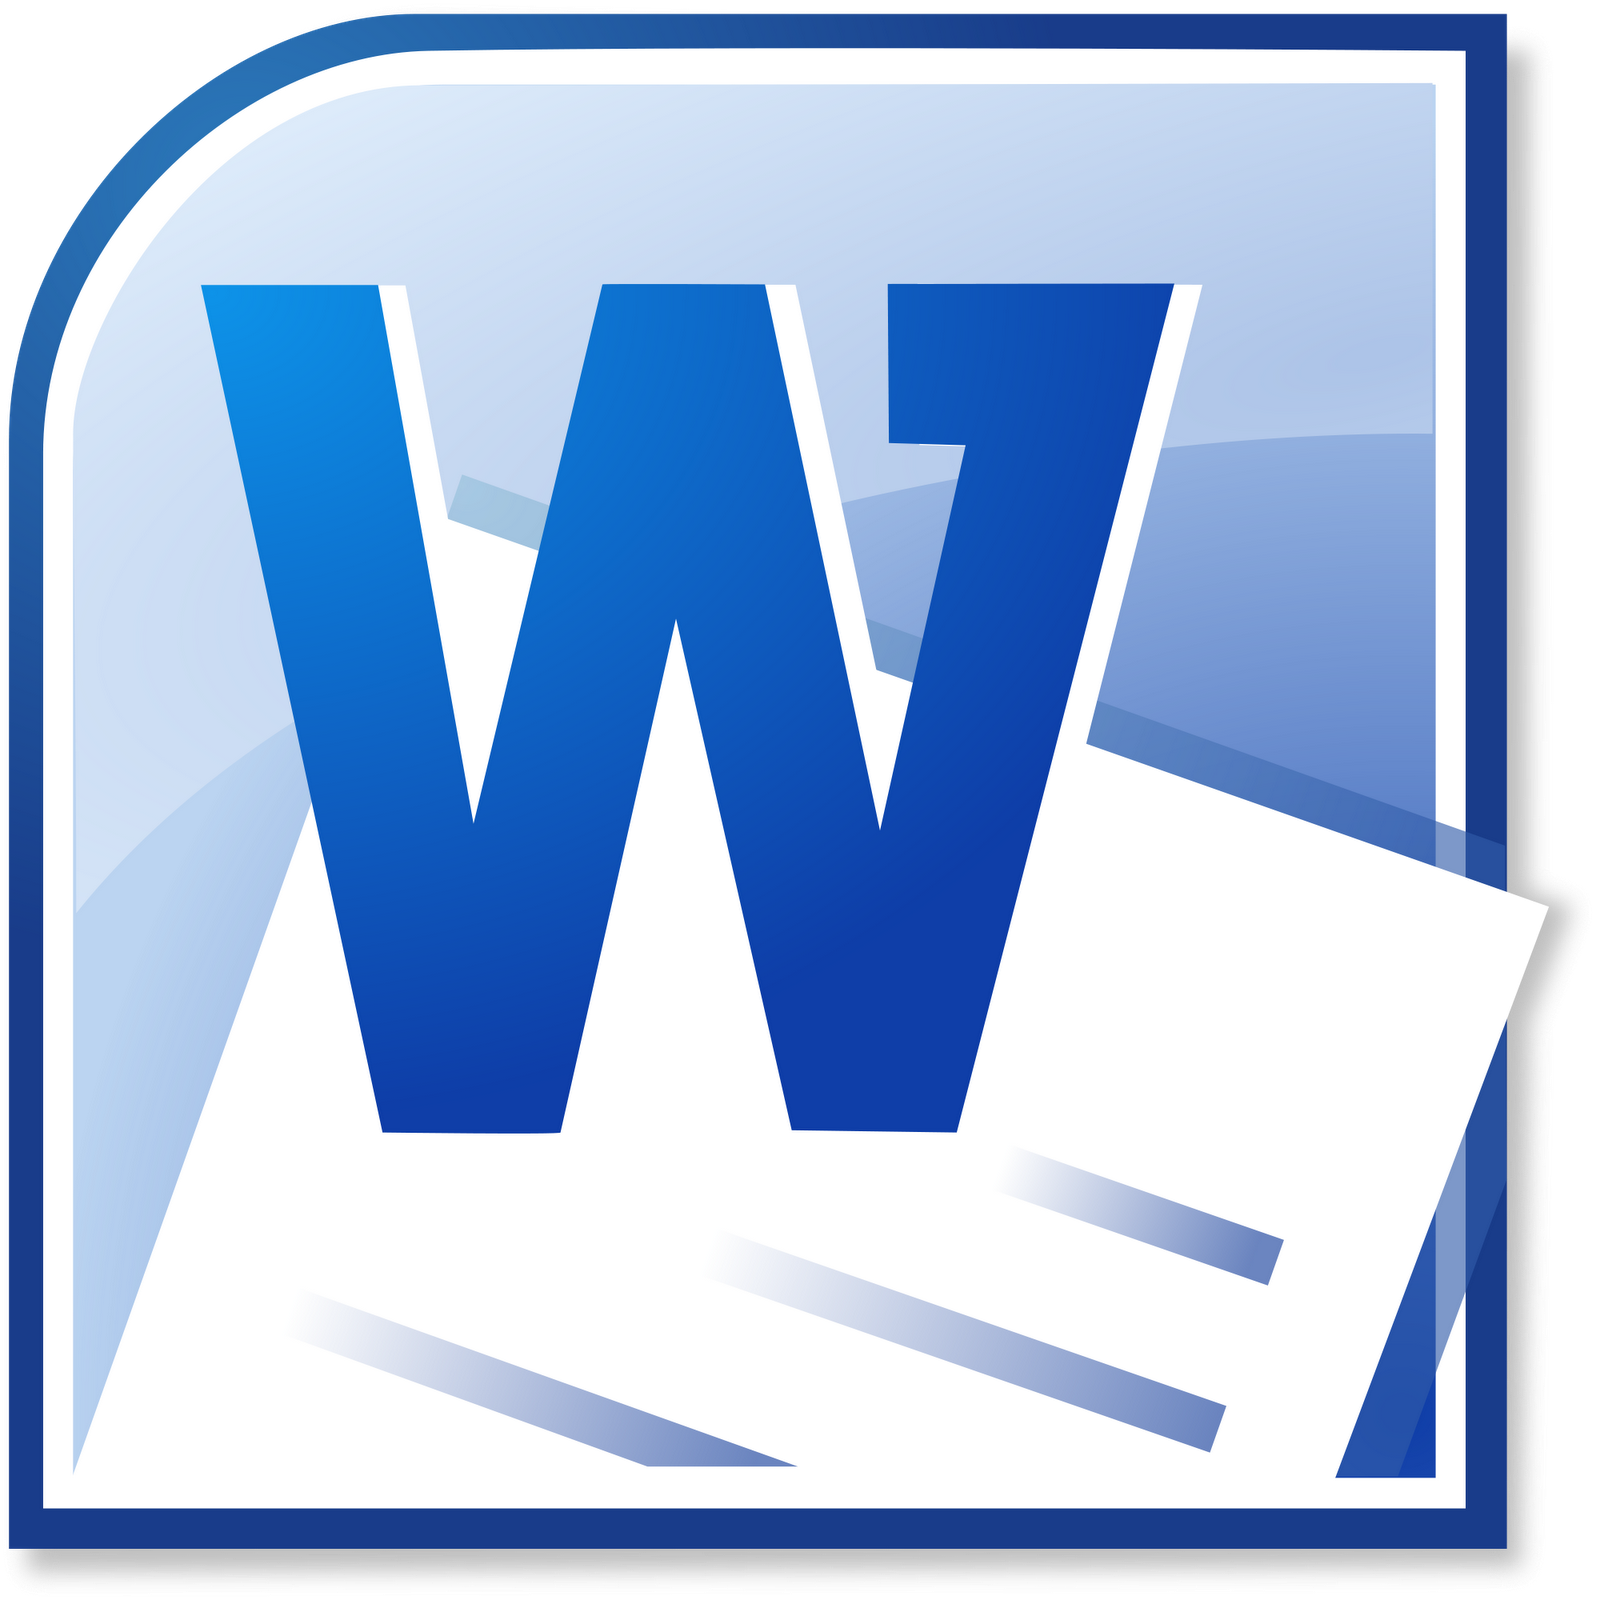 Microsoft Word - อับดุลรอมาน ดะเละ